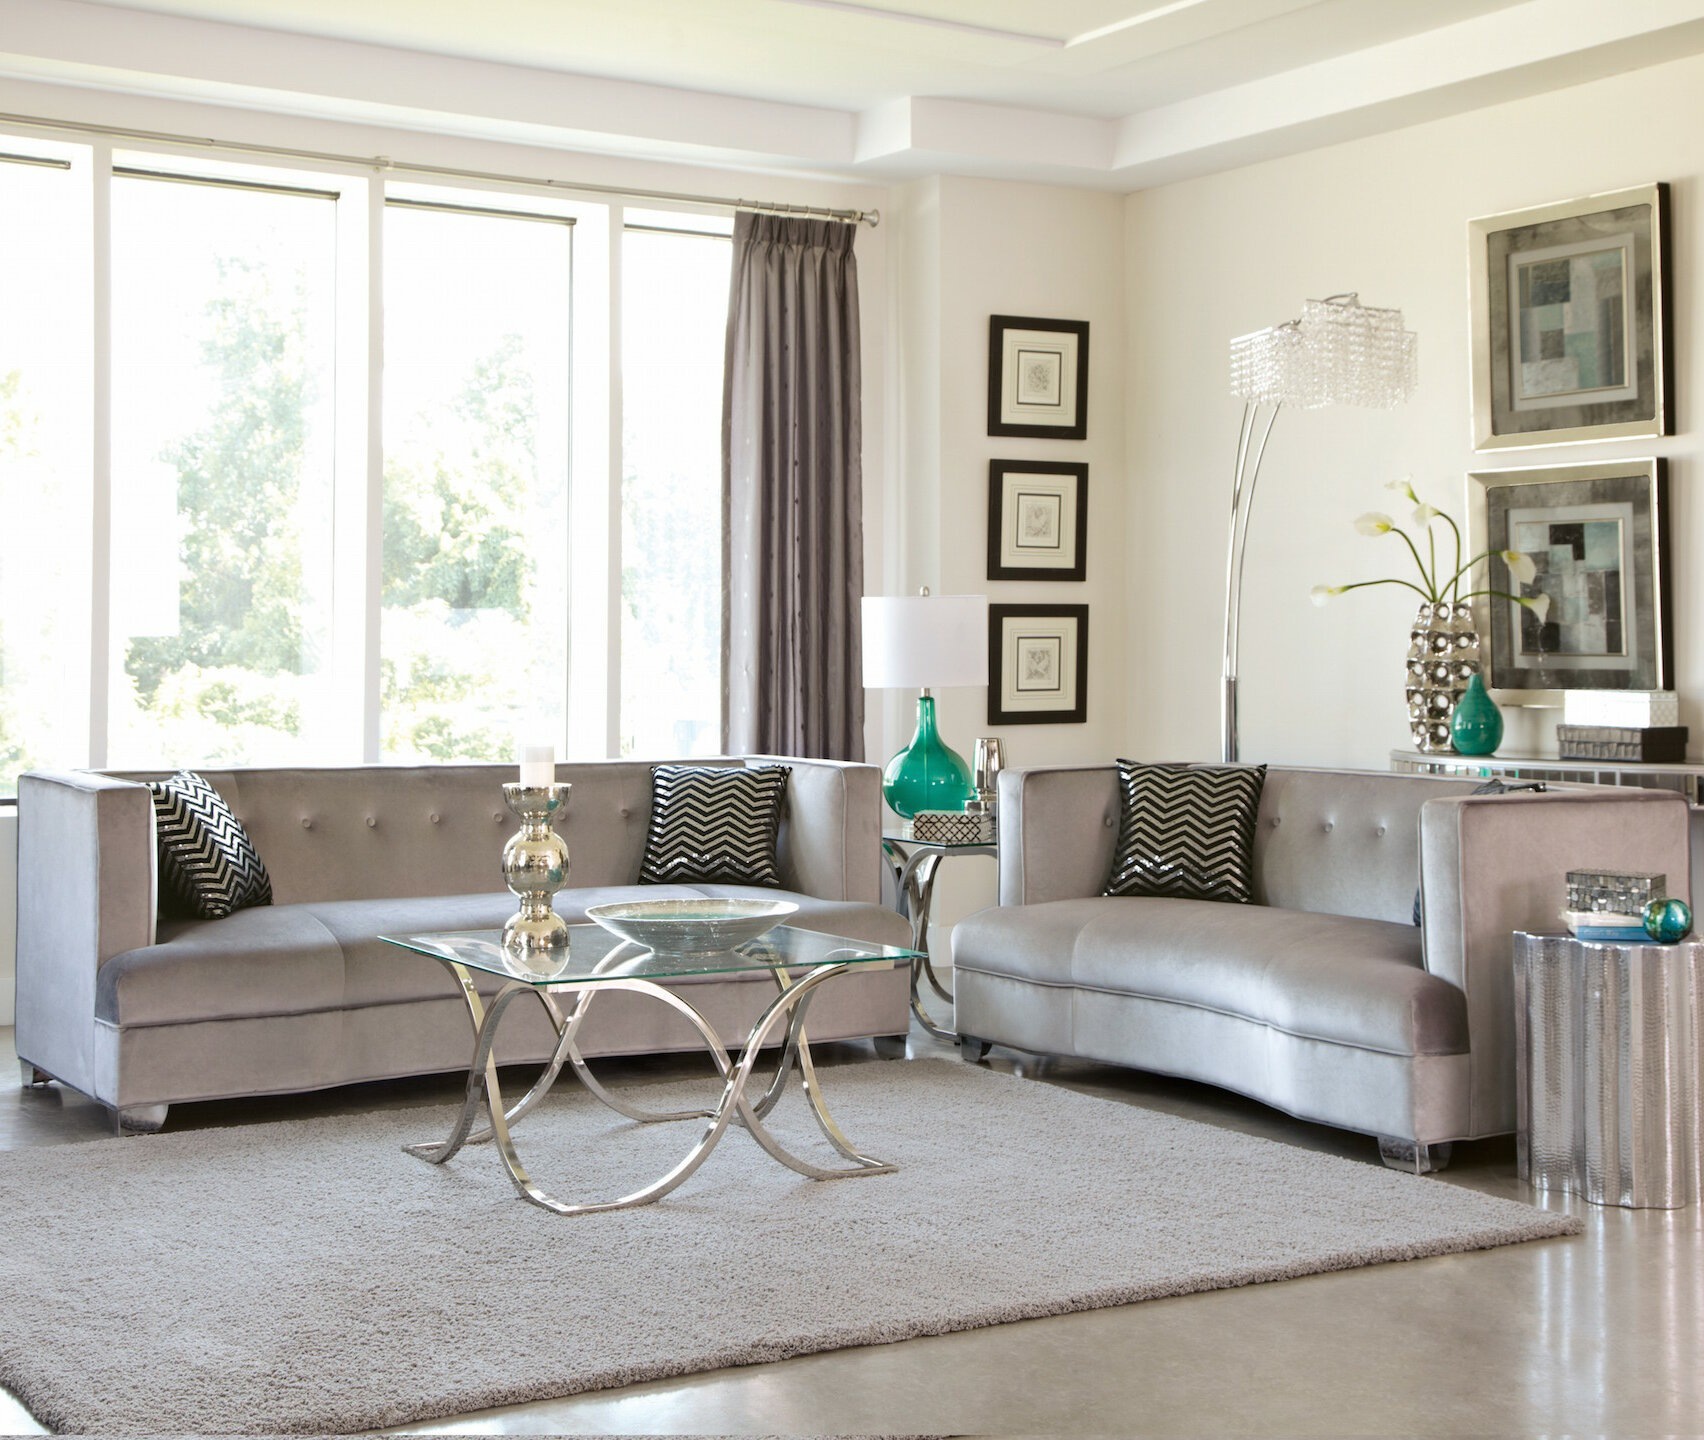 Infini Furnishings Glen Cove 2 Piece Living Room Set | Wayfair